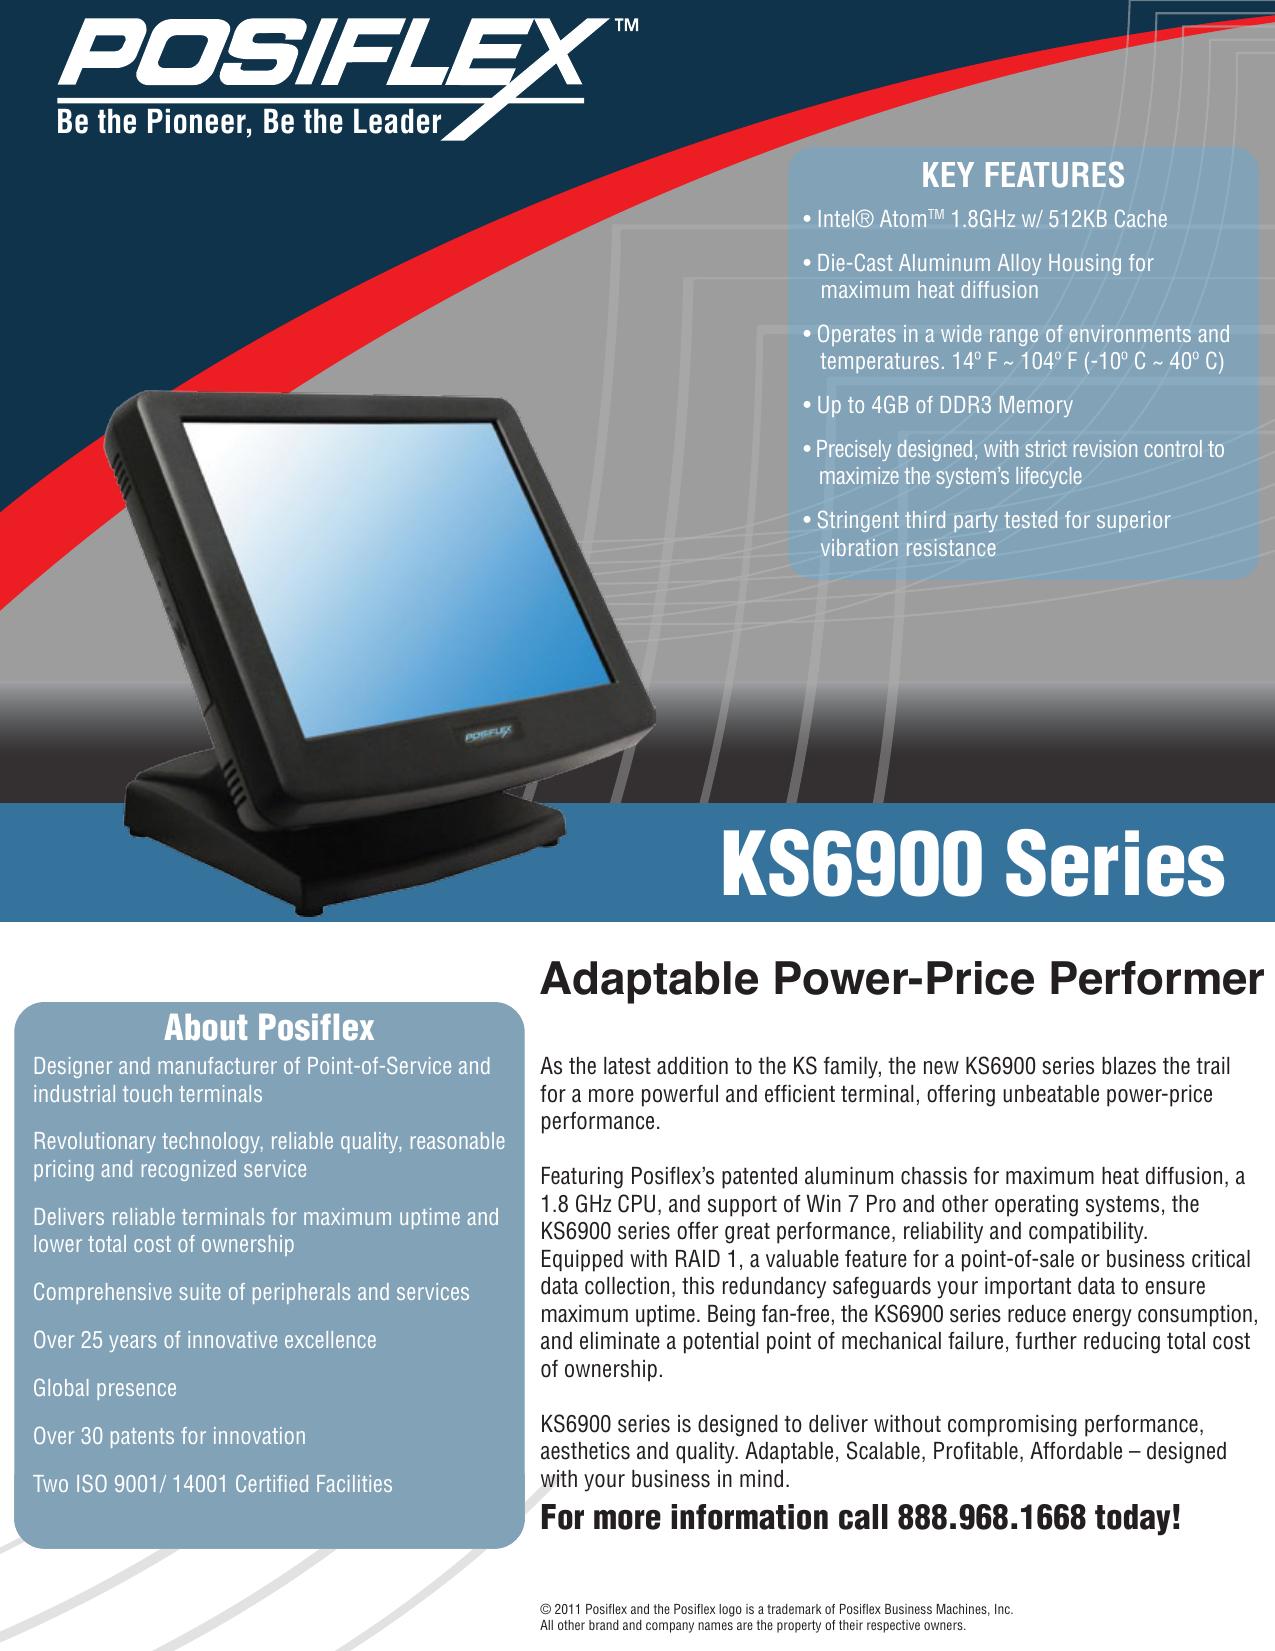 KS6900-PosiflexUSA 06-17-11 | manualzz com